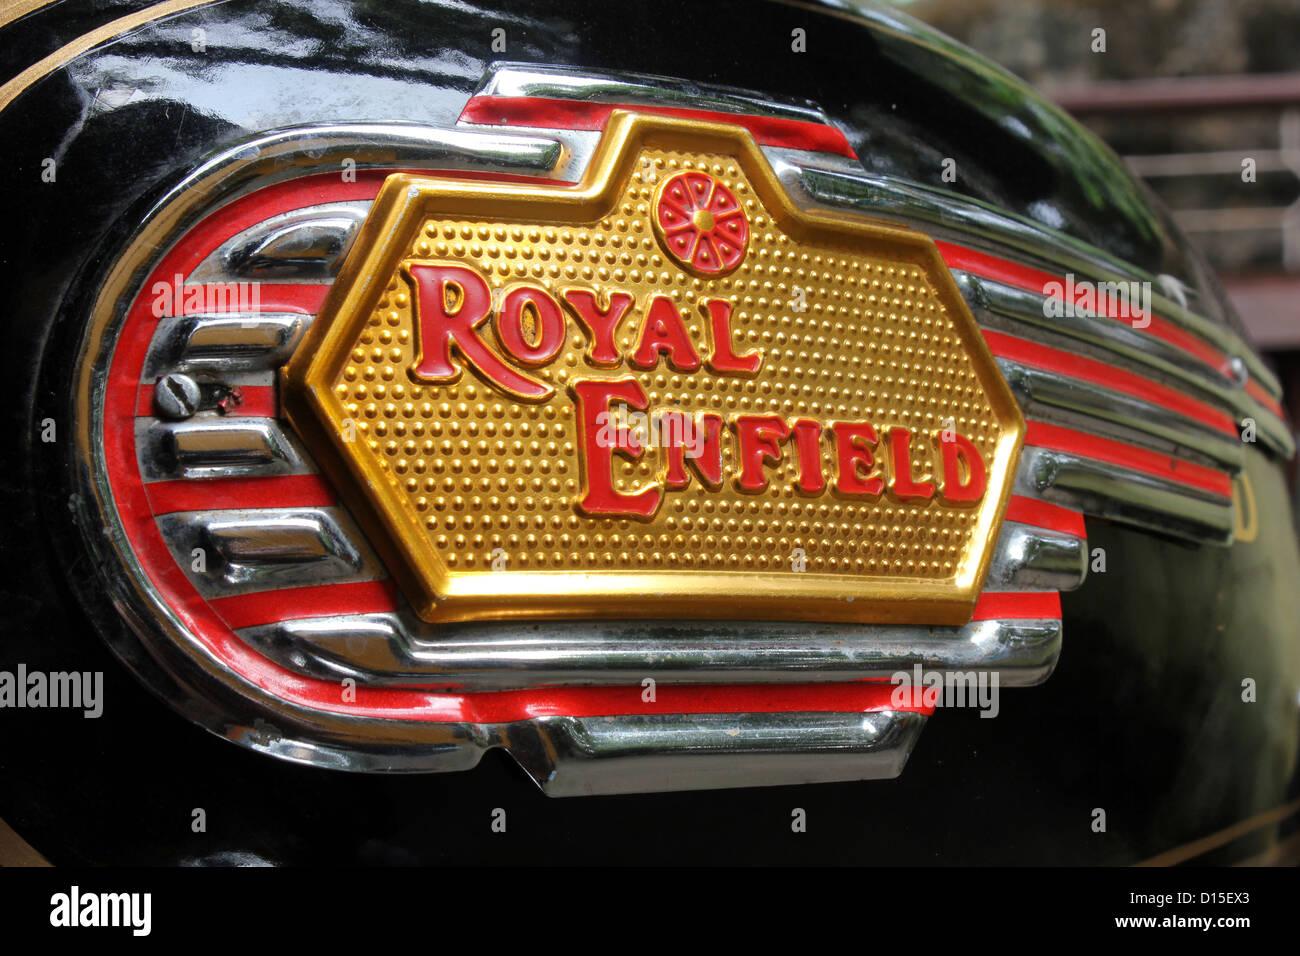 Royal Enfield Motorcycle - Stock Image